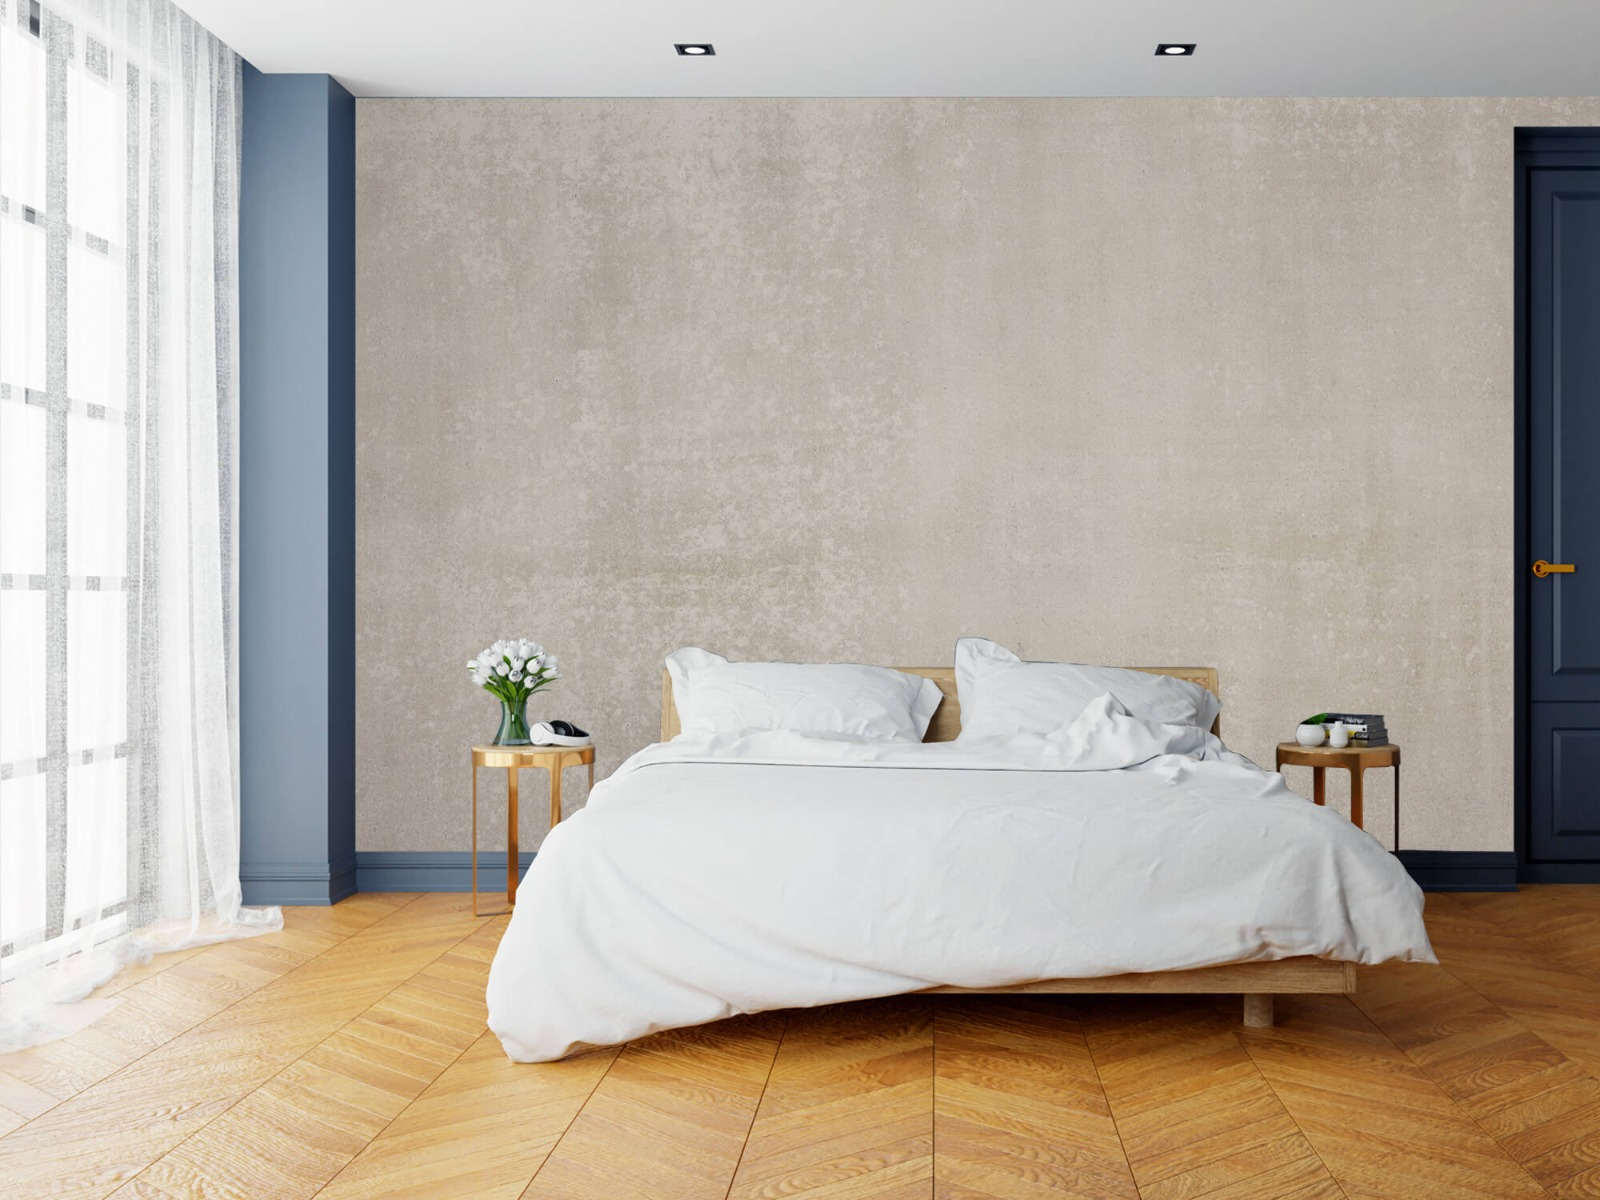 Betonlook behang - Taupe beton - Wallexclusive - Woonkamer 16